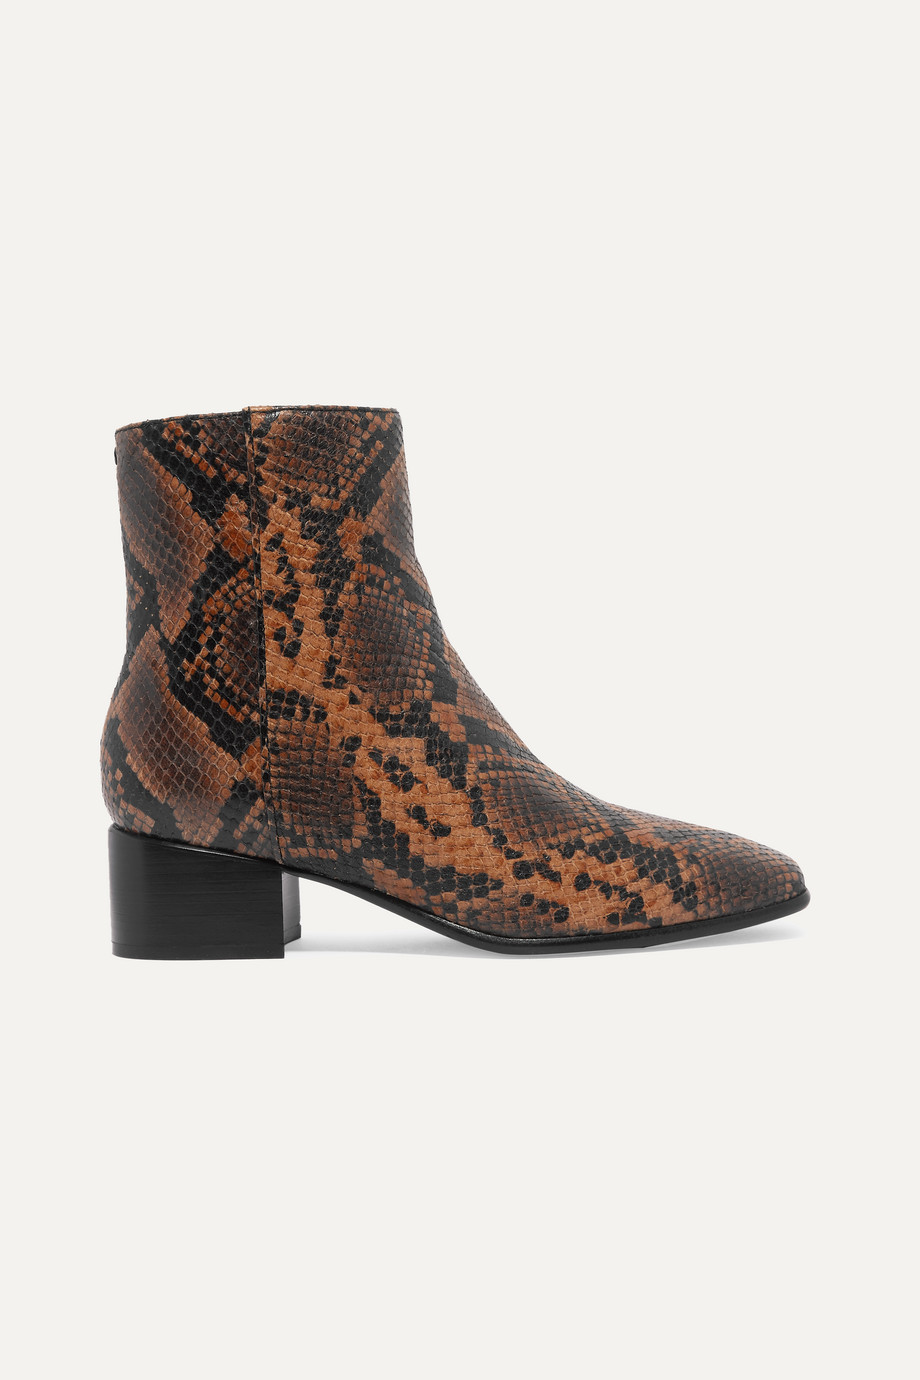 rag & bone Aslen snake-effect leather ankle boots